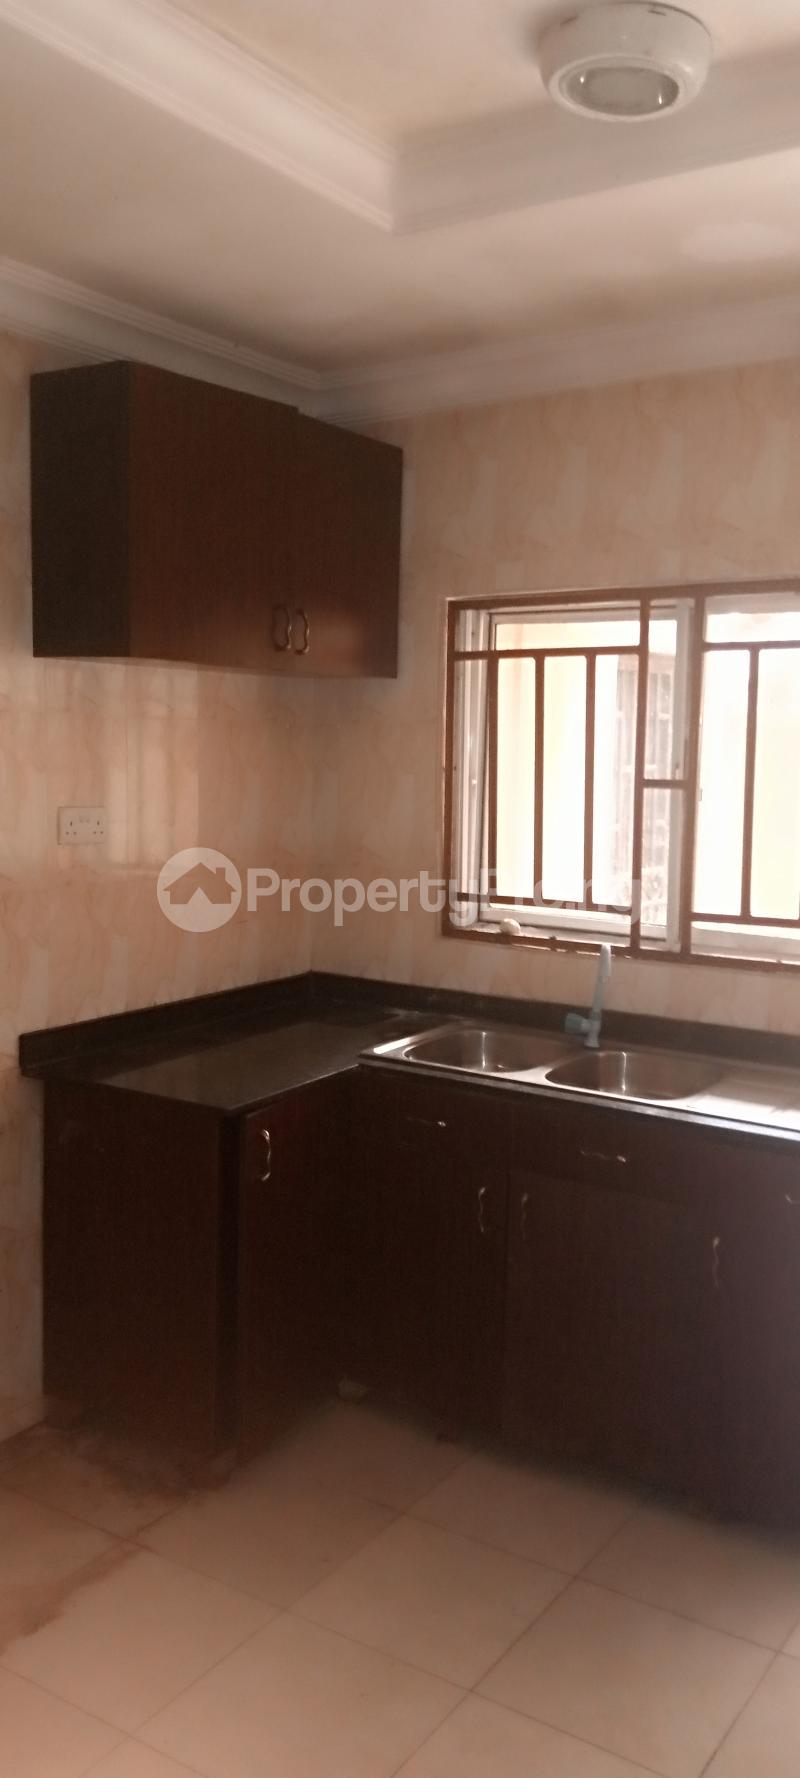 5 bedroom House for rent Estate drive Omole phase 2 Ojodu Lagos - 20